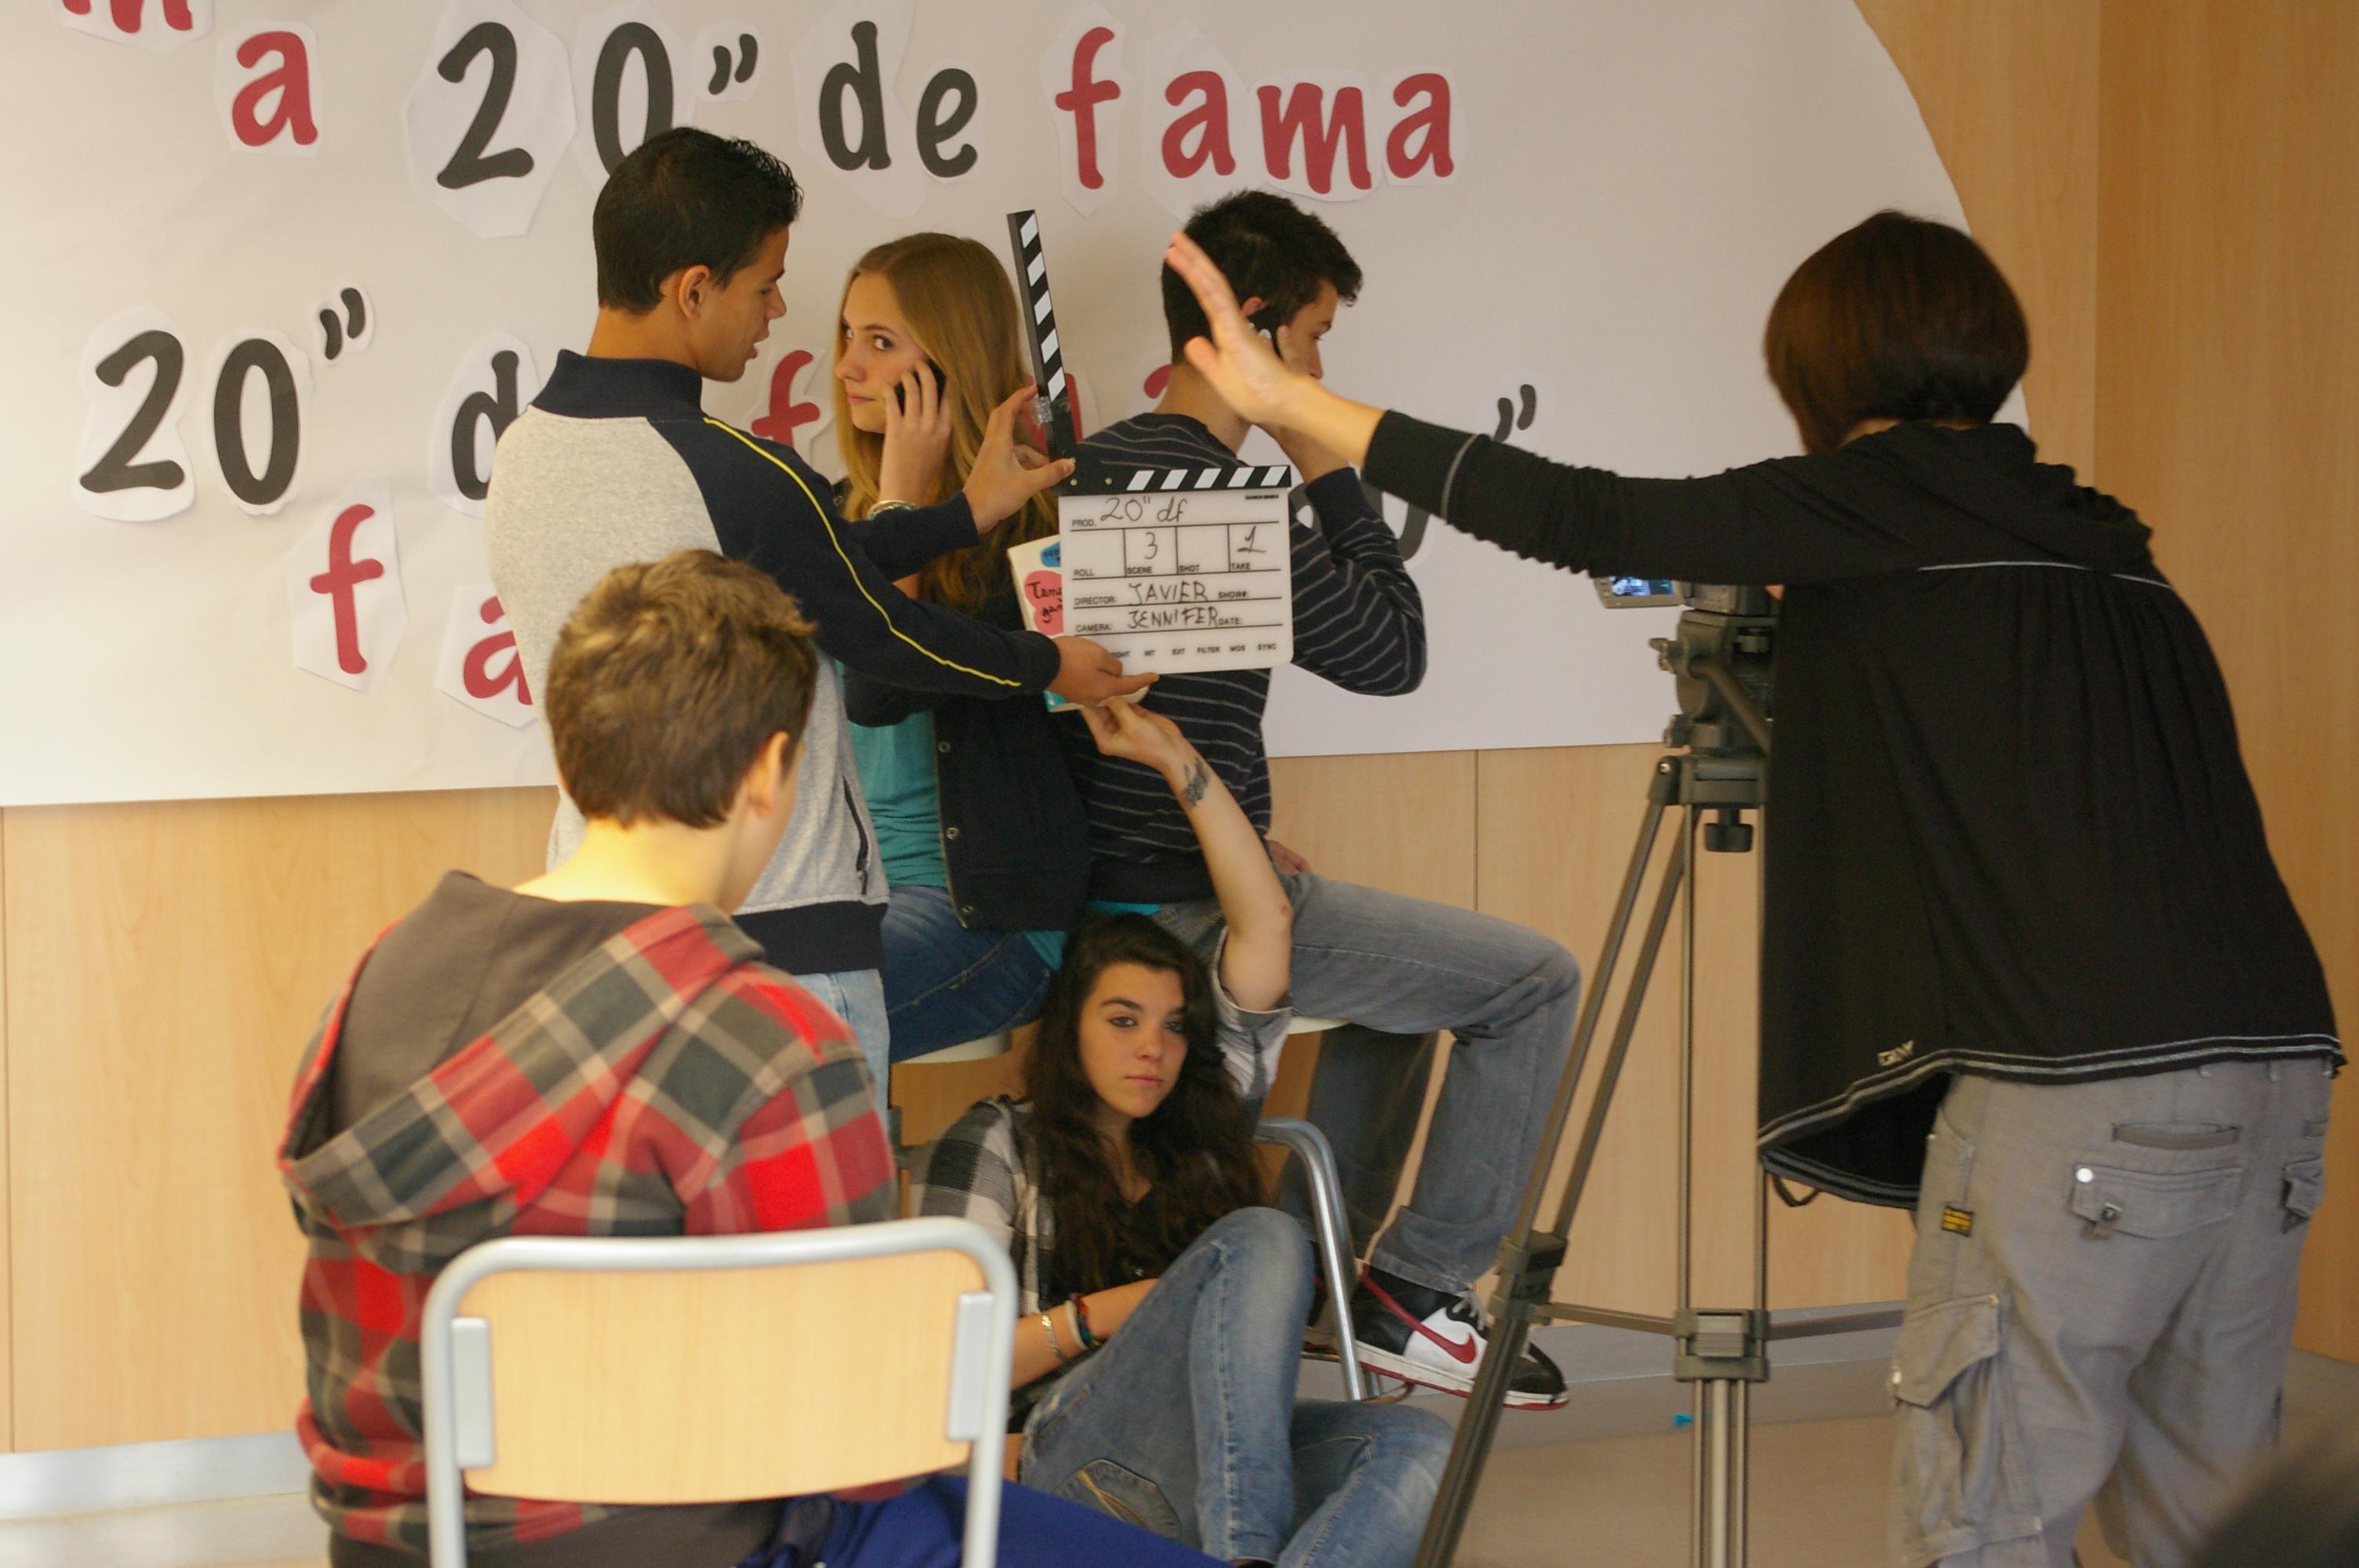 http://blog.educalab.es/cniie/wp-content/uploads/sites/3/2013/07/Foto-1.jpg